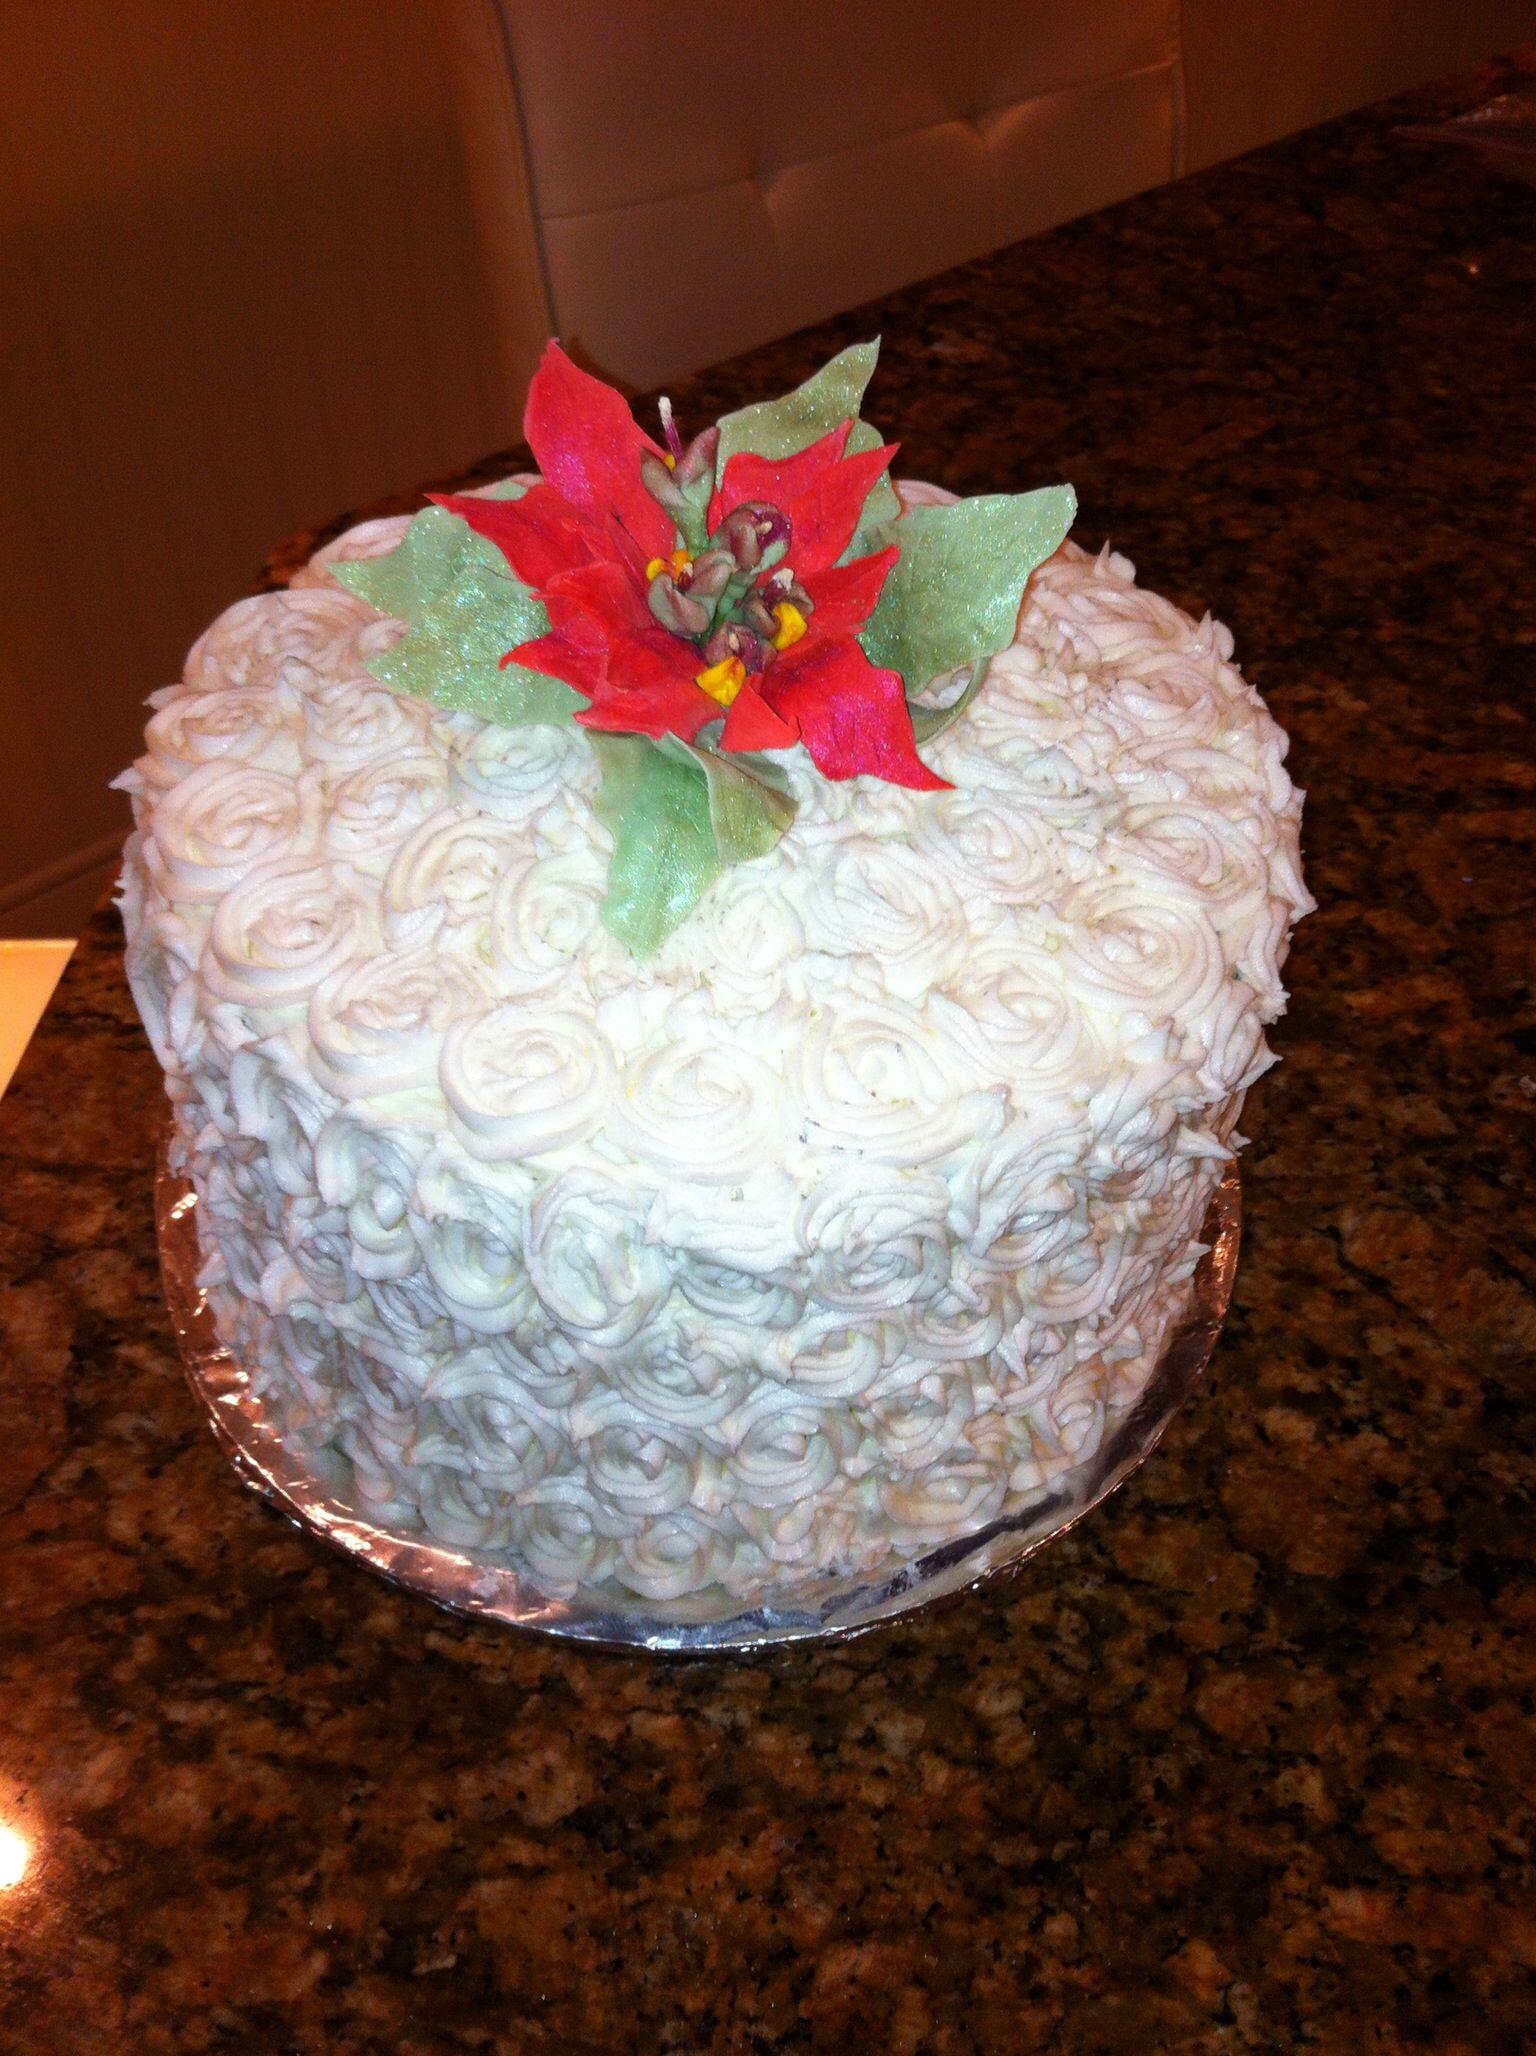 Moms Birthday Cake On December 22 Cakes Pinterest Mom Birthday